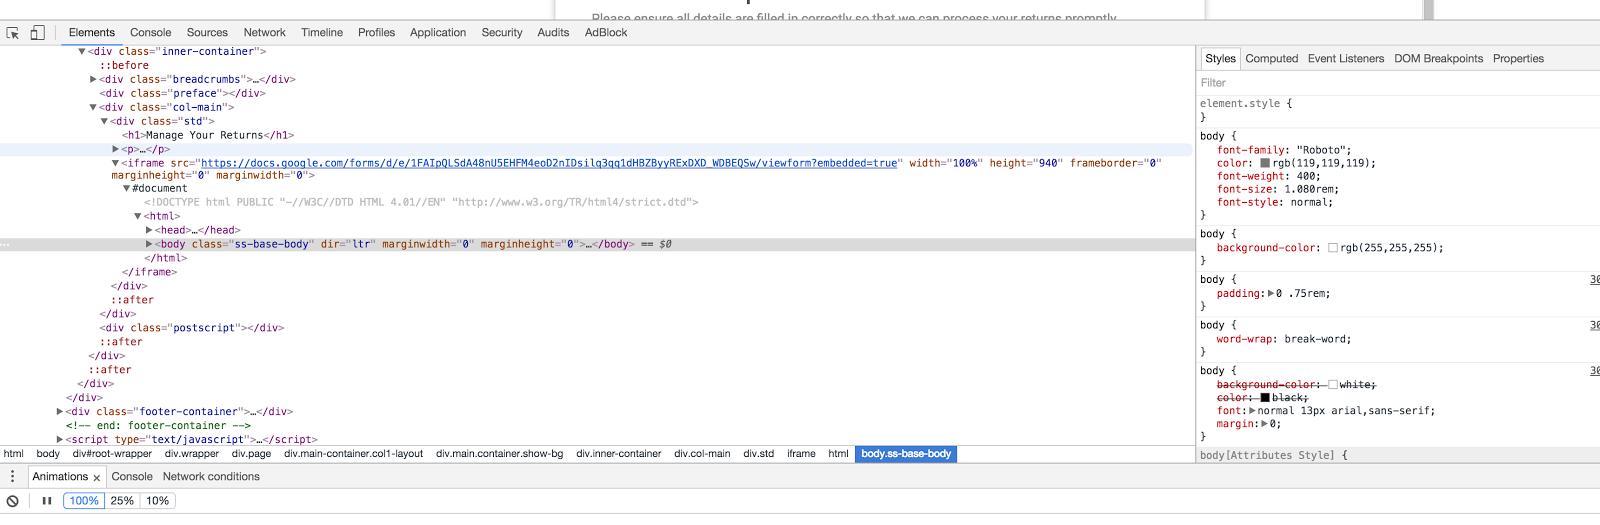 embedding google form not working on wordpress - Edytory